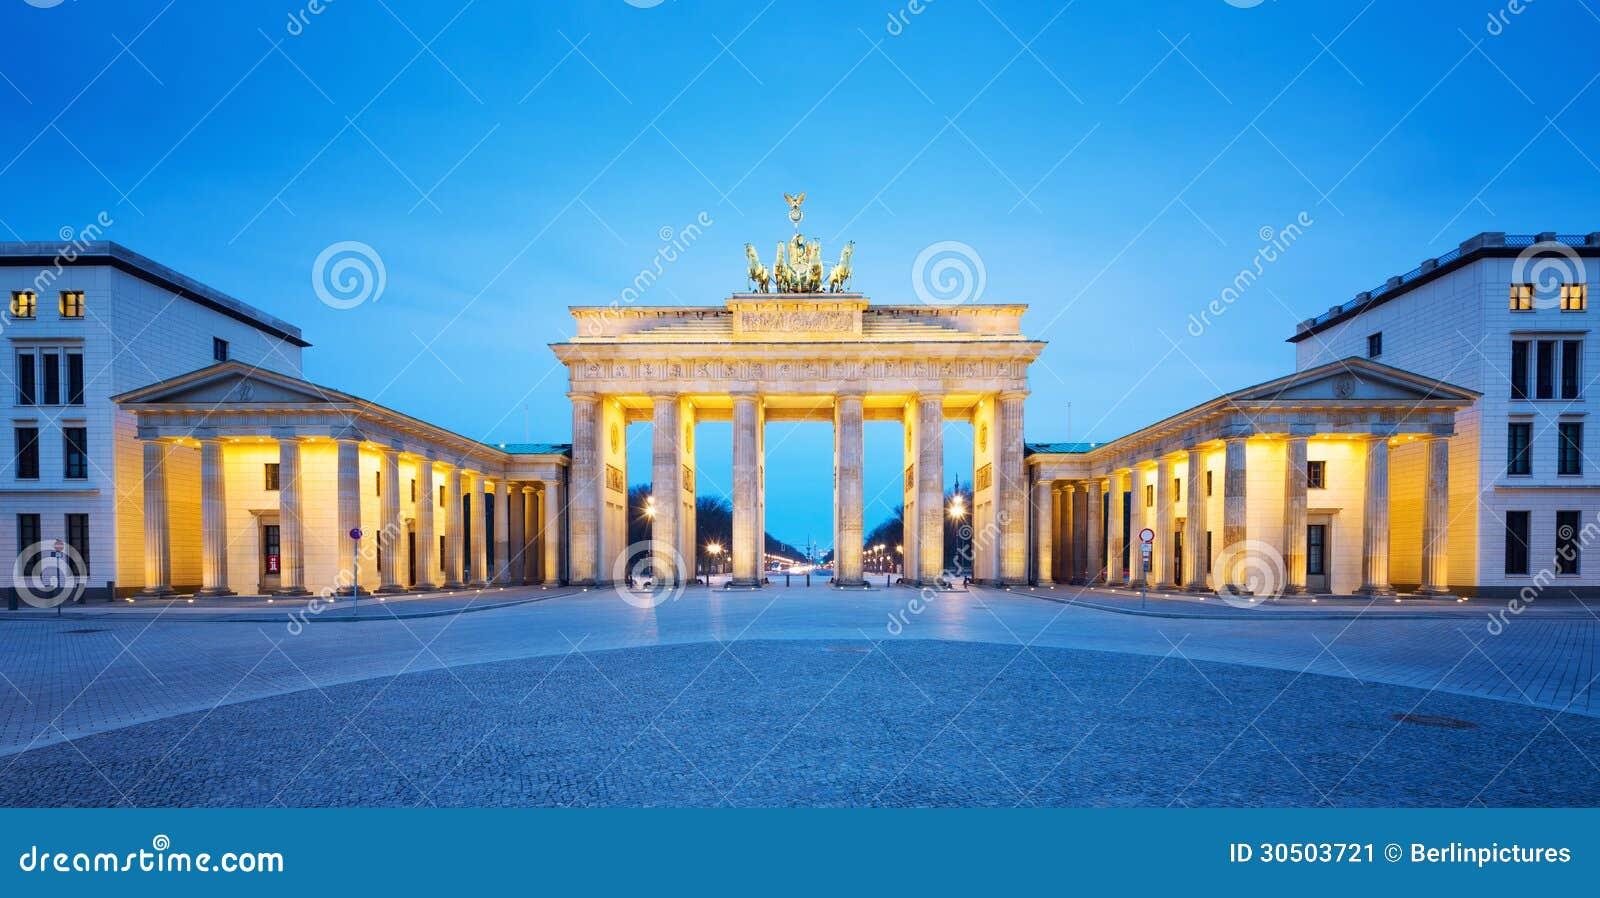 Brandenburger Tor (Brandenburg Gate) panorama, famous landmark in Berlin Germany night